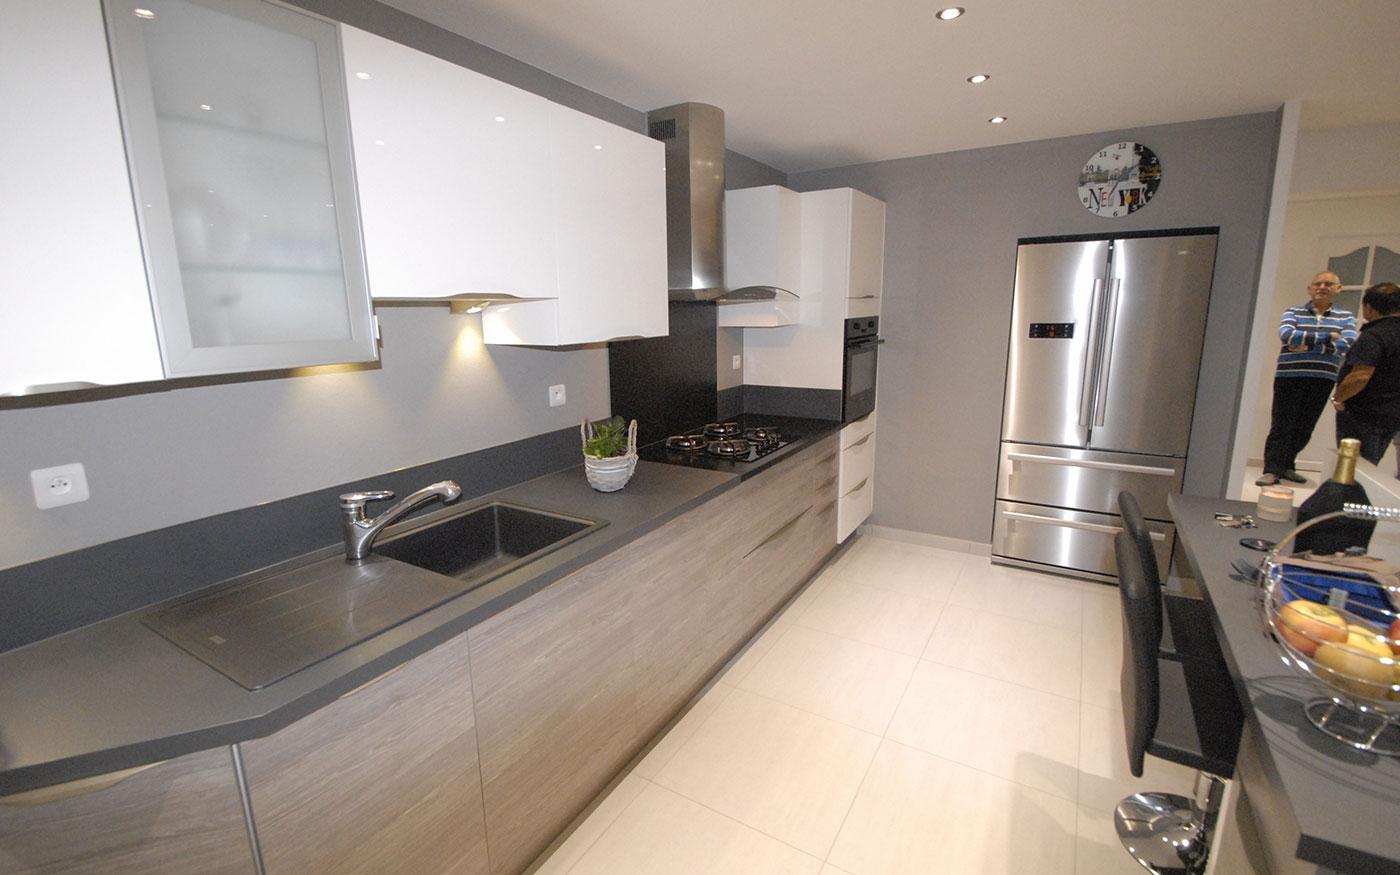 art deko concept cuisiniste le pont de beauvoisin. Black Bedroom Furniture Sets. Home Design Ideas